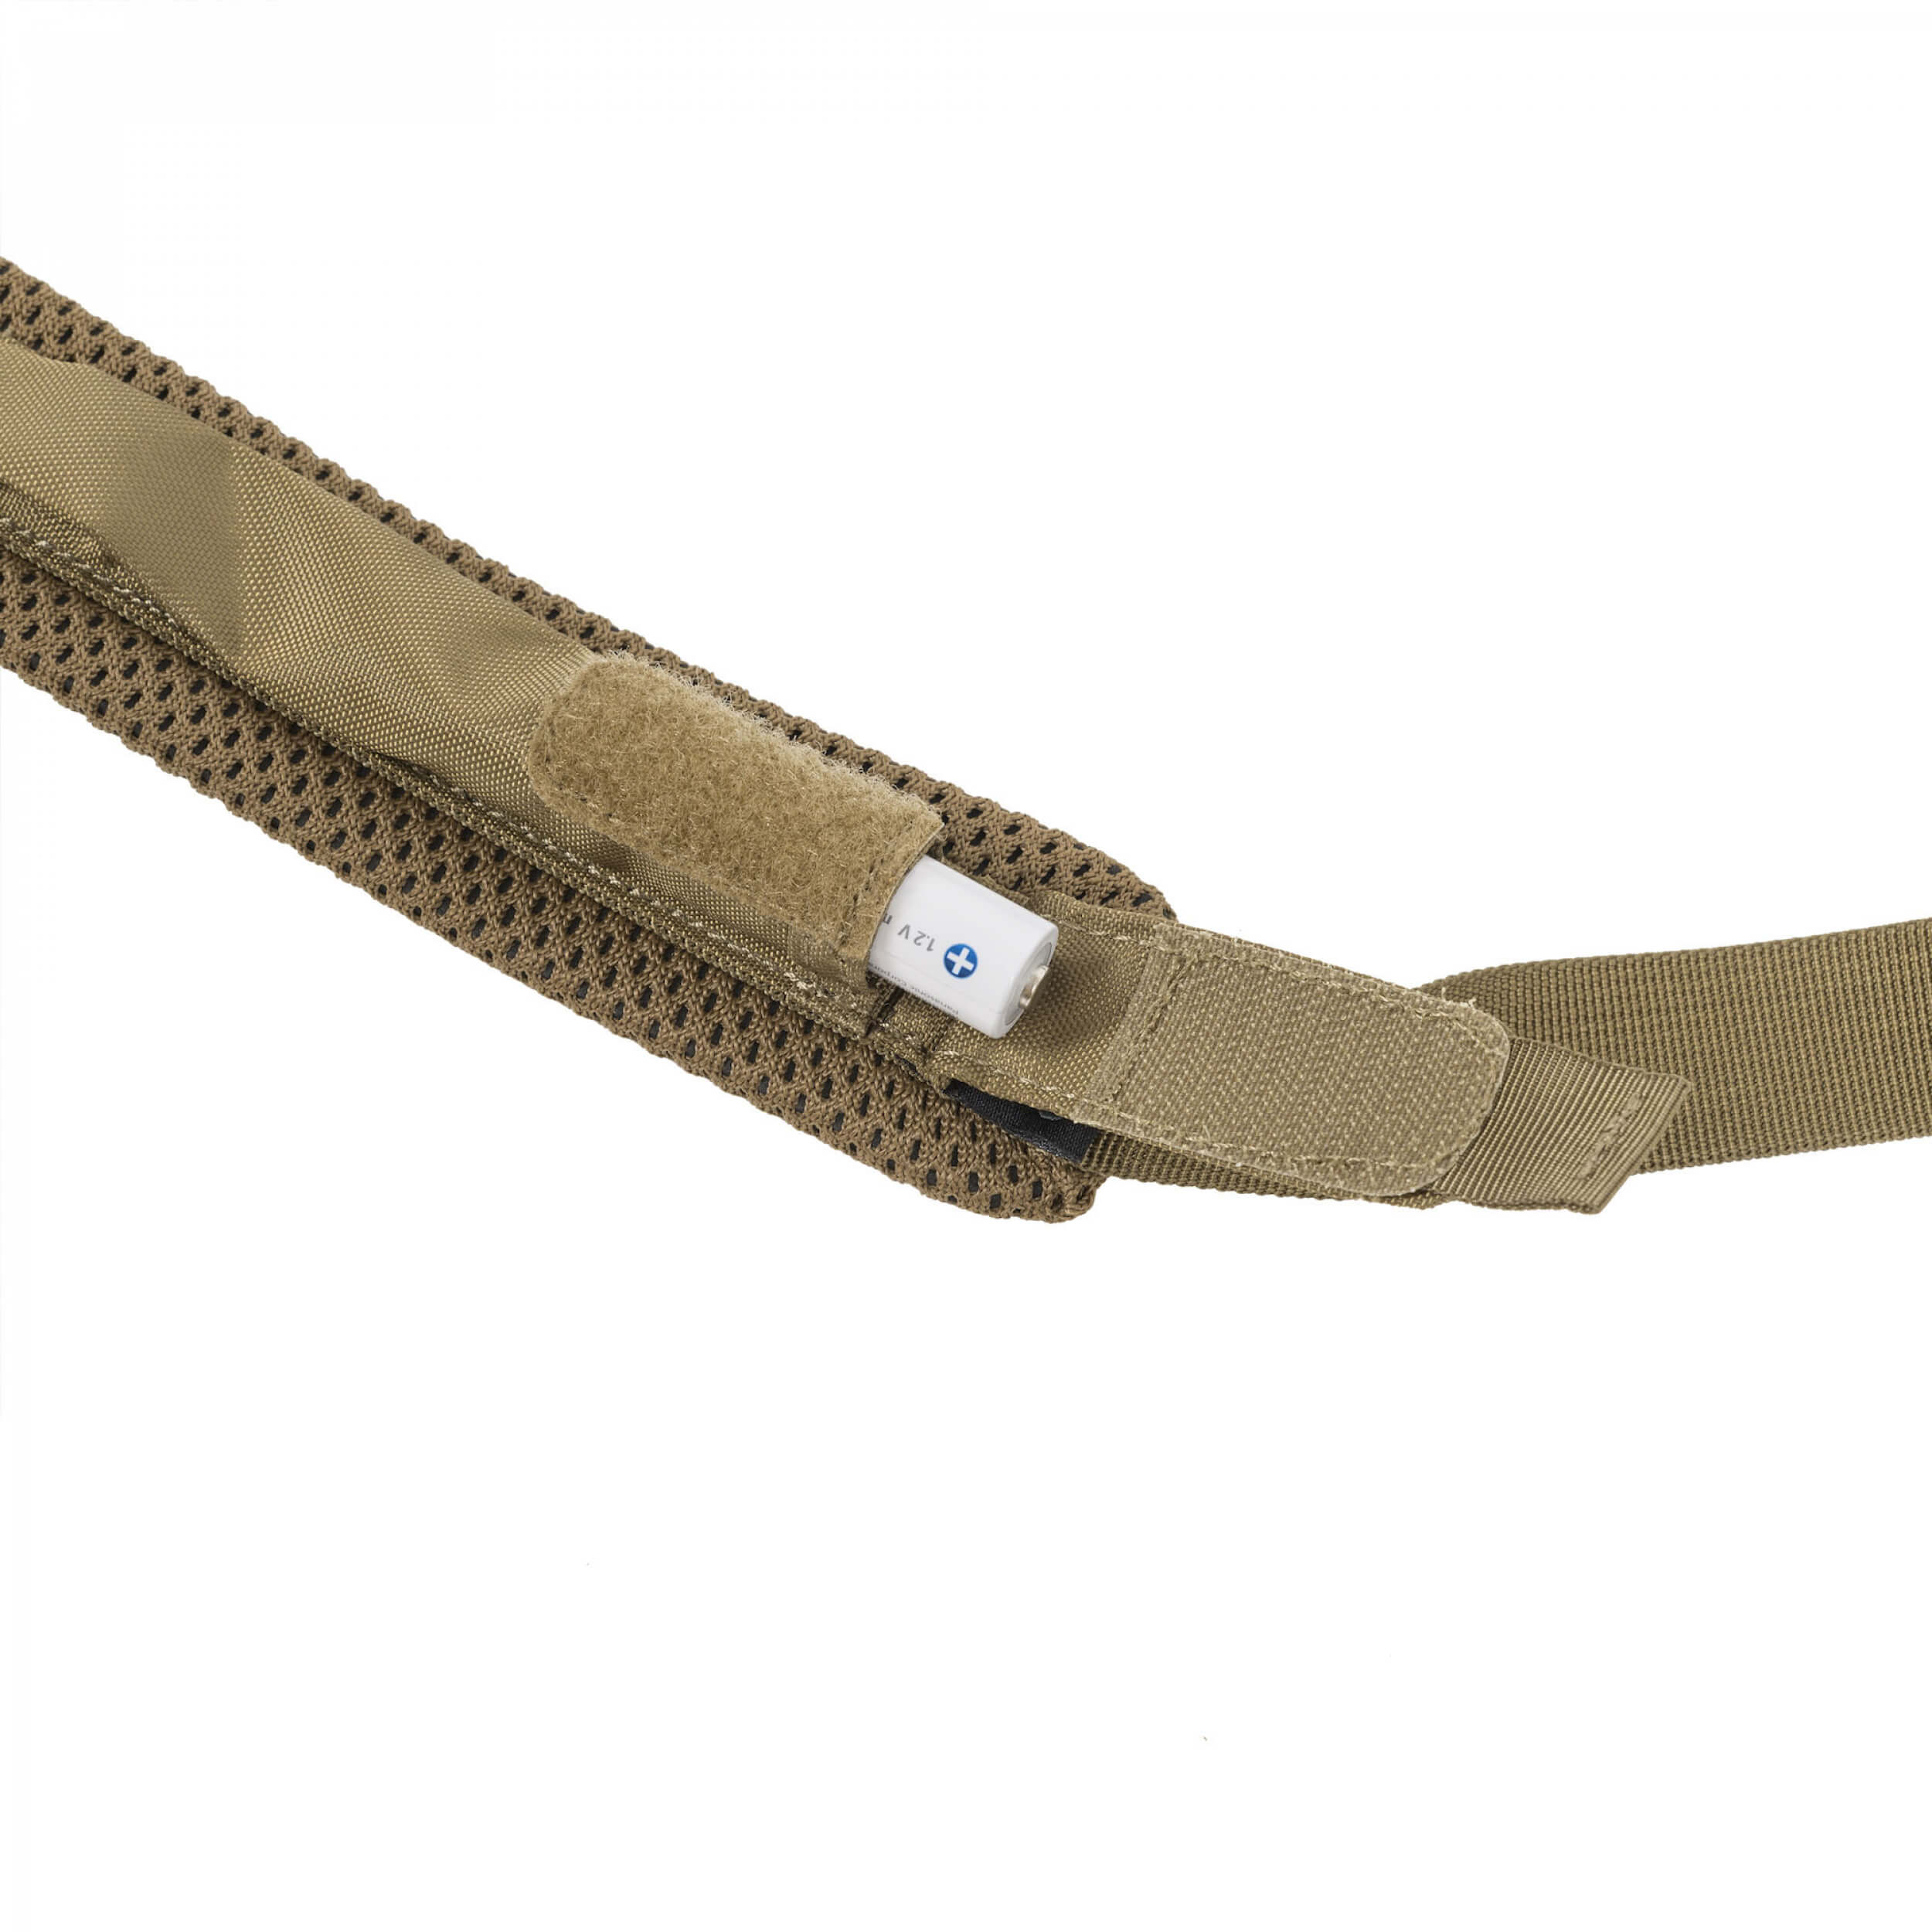 Helikon-Tex Two Point Carbine Sling (Gewehrriemen) - Polyester - Shadow Grey